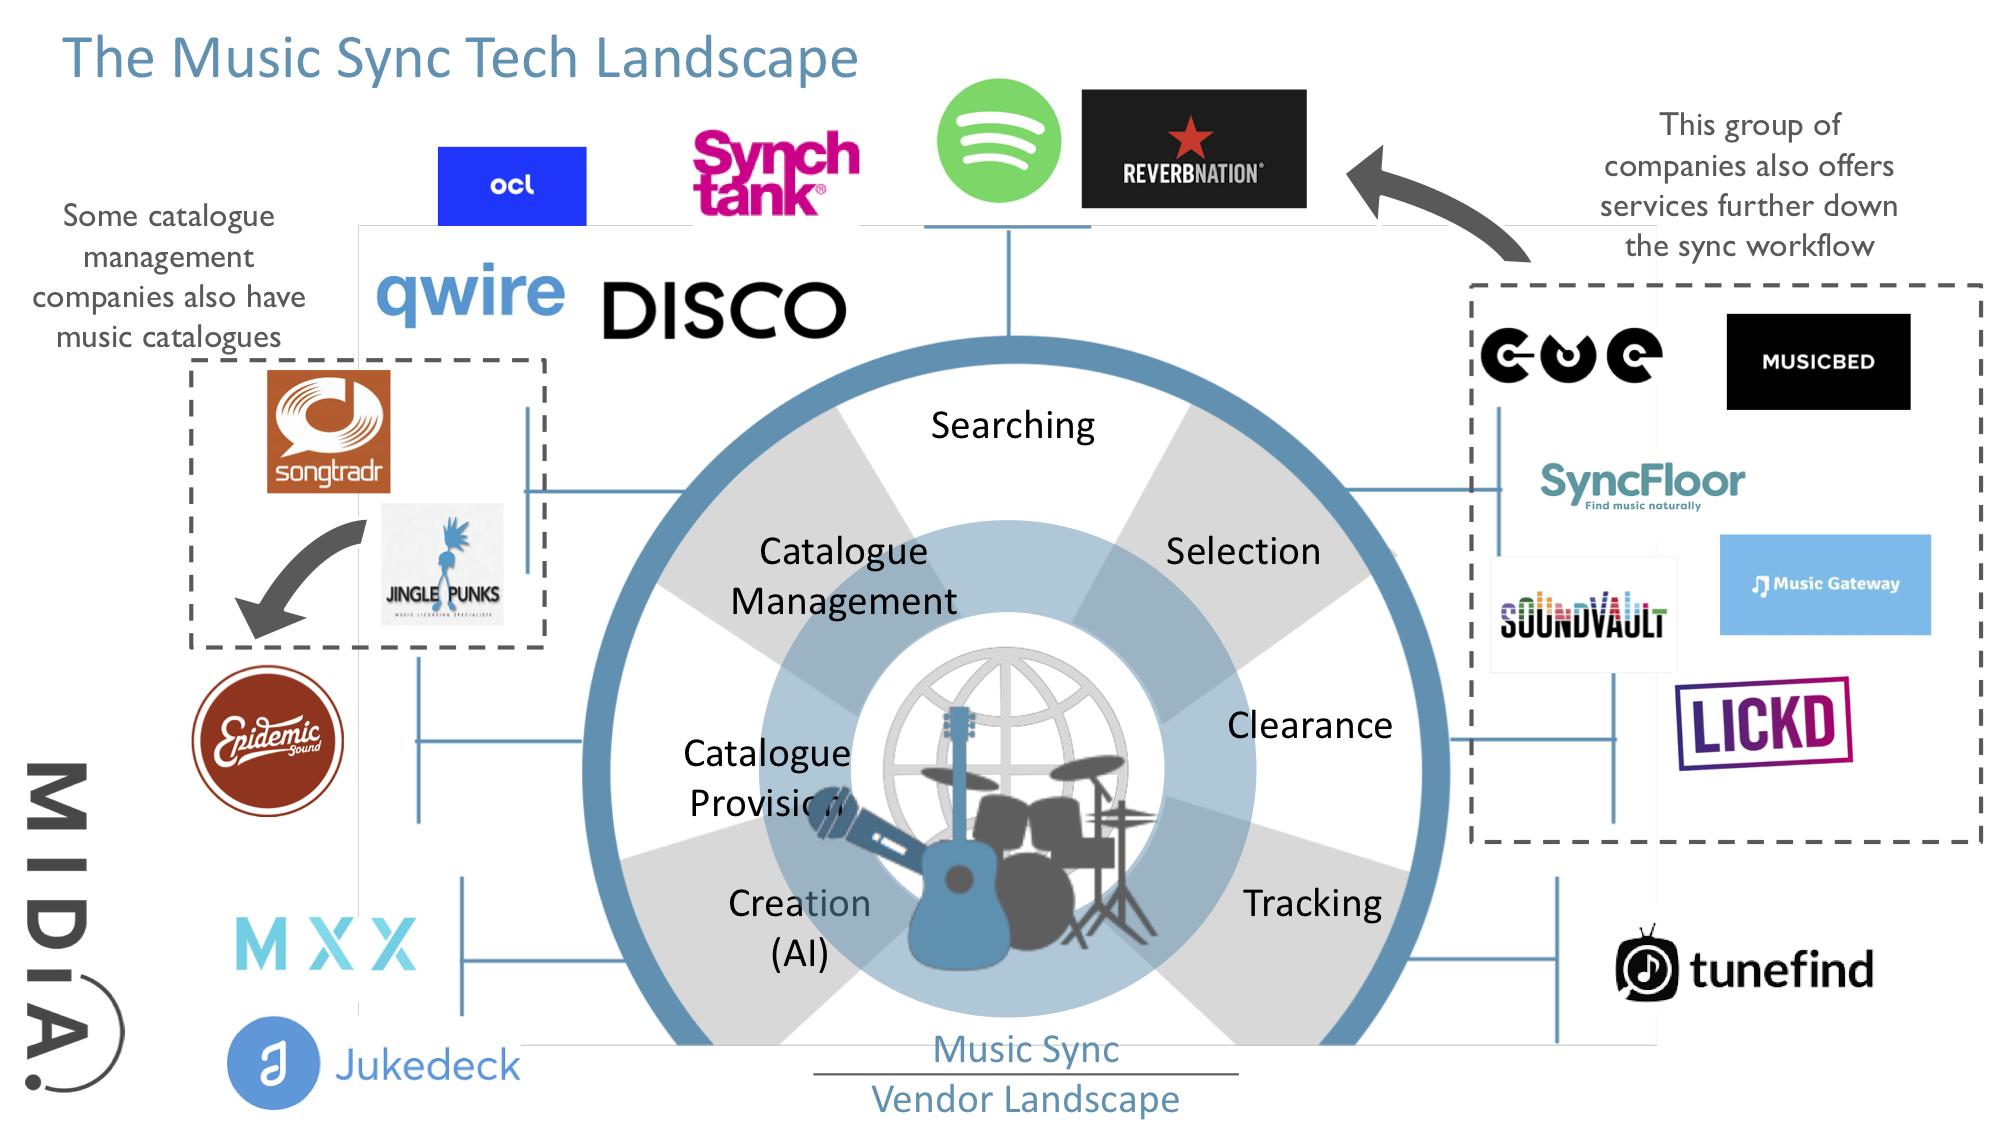 midia music sync tech landscape